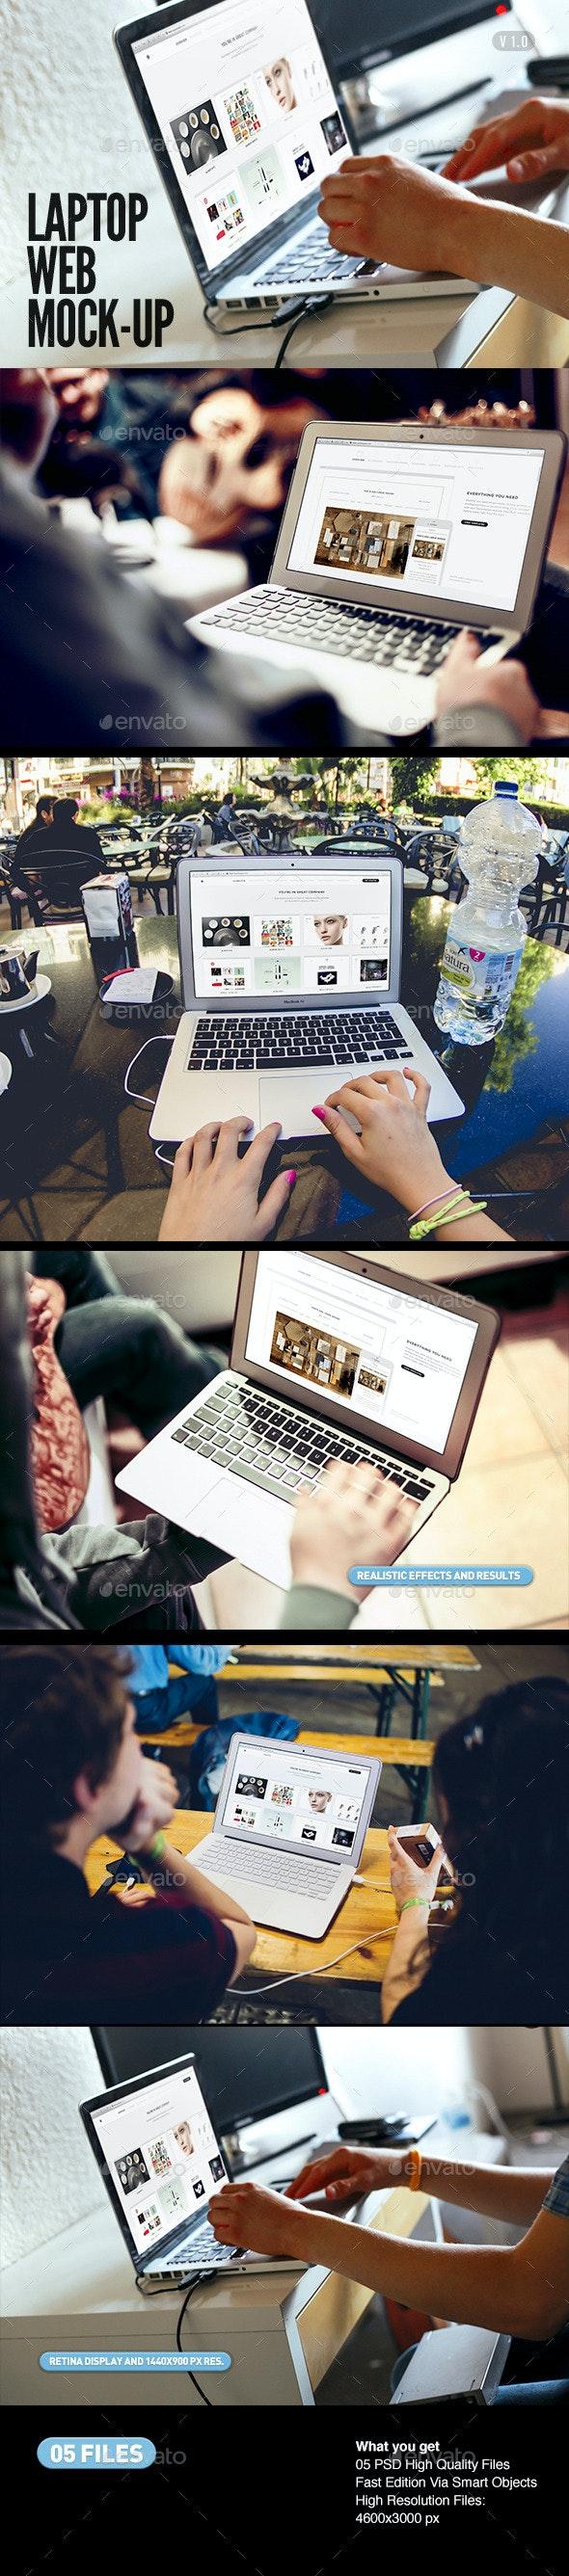 Laptop | Screen Web App Mock-Up - Laptop Displays